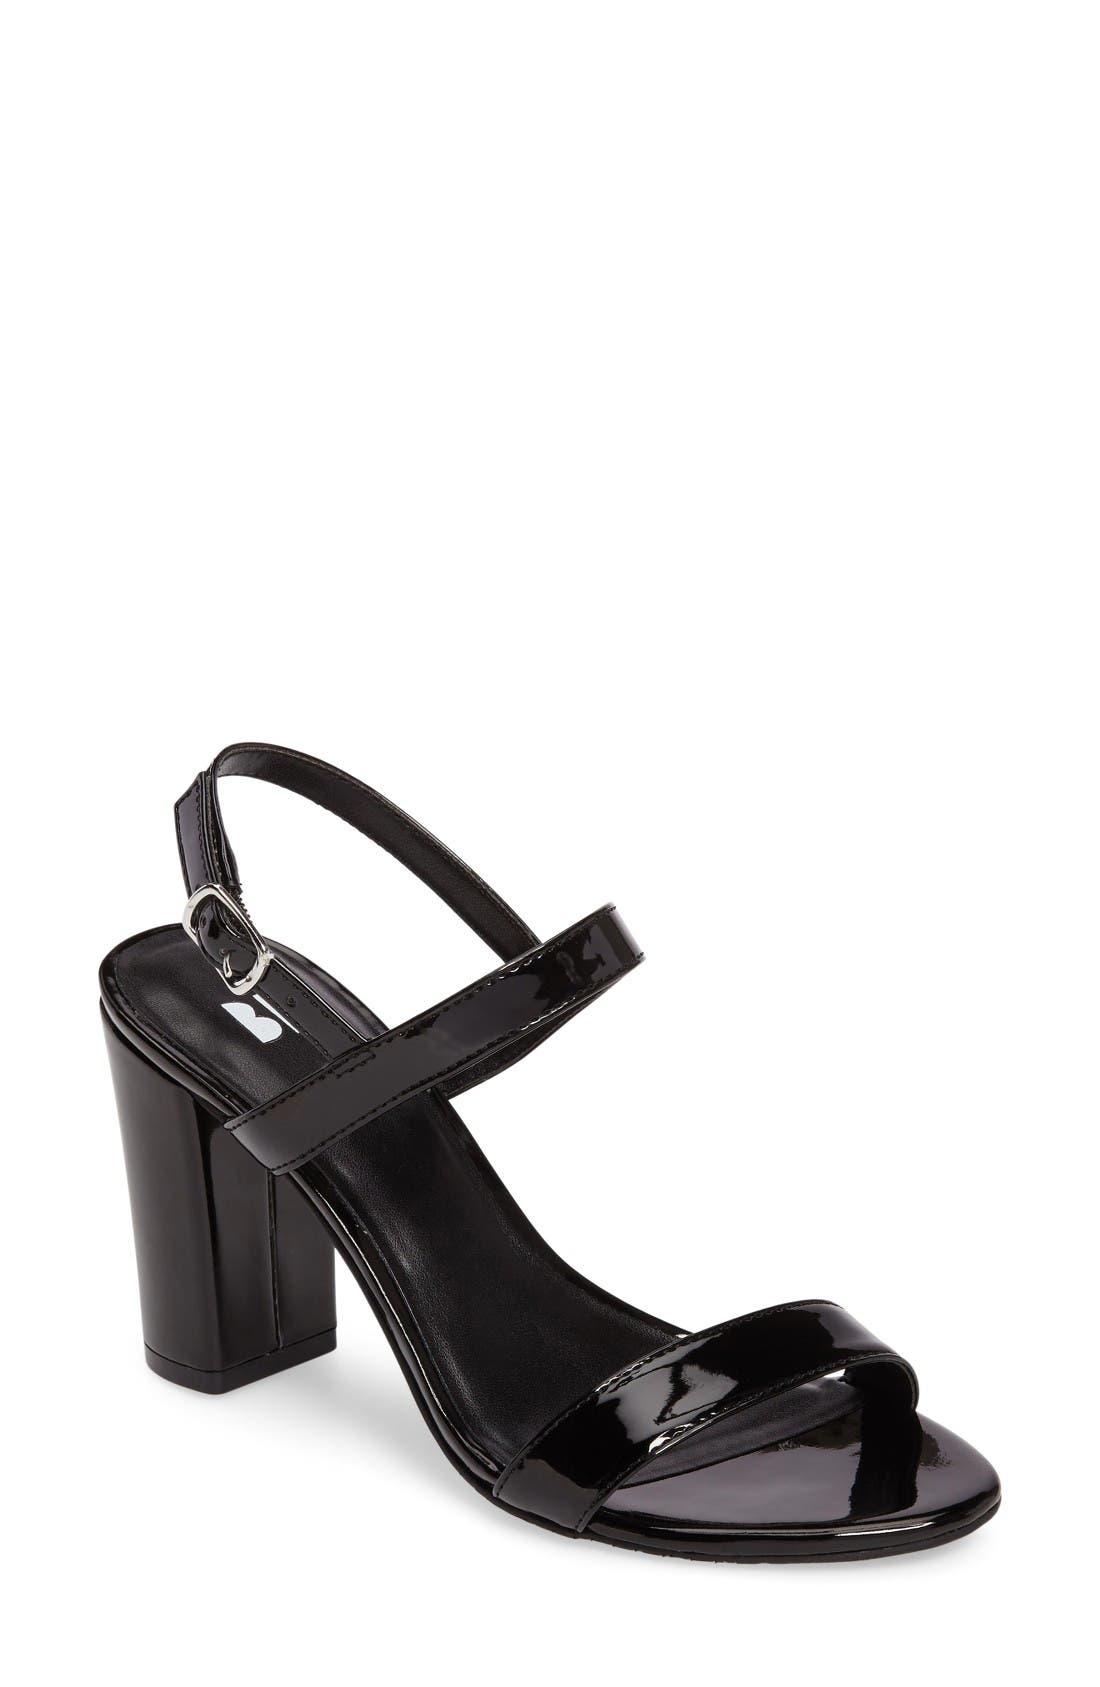 Alternate Image 1 Selected - BP. Lula Block Heel Slingback Sandal (Women)